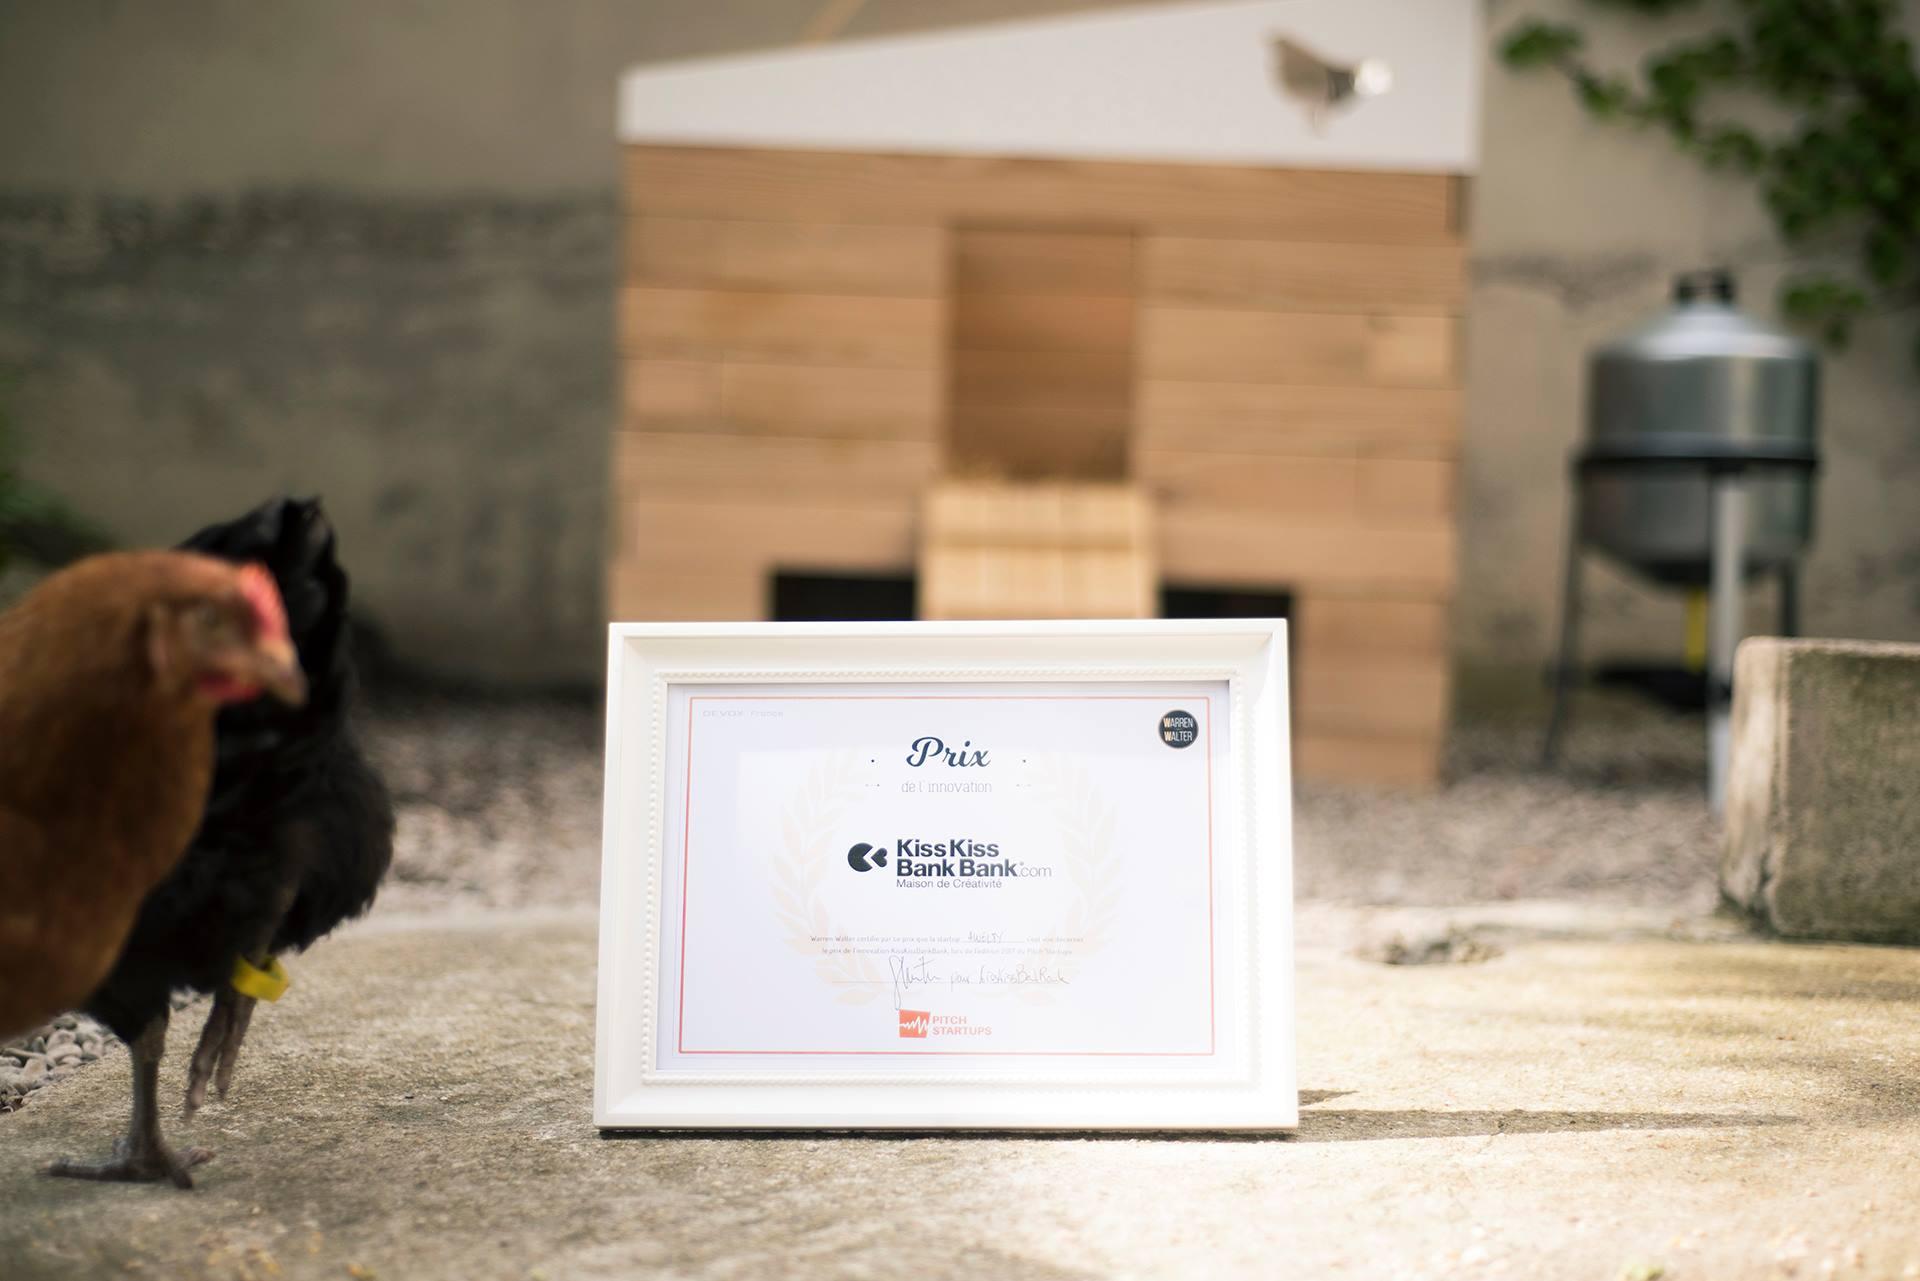 Eggs iting remporte un prix à Devoxx 2017